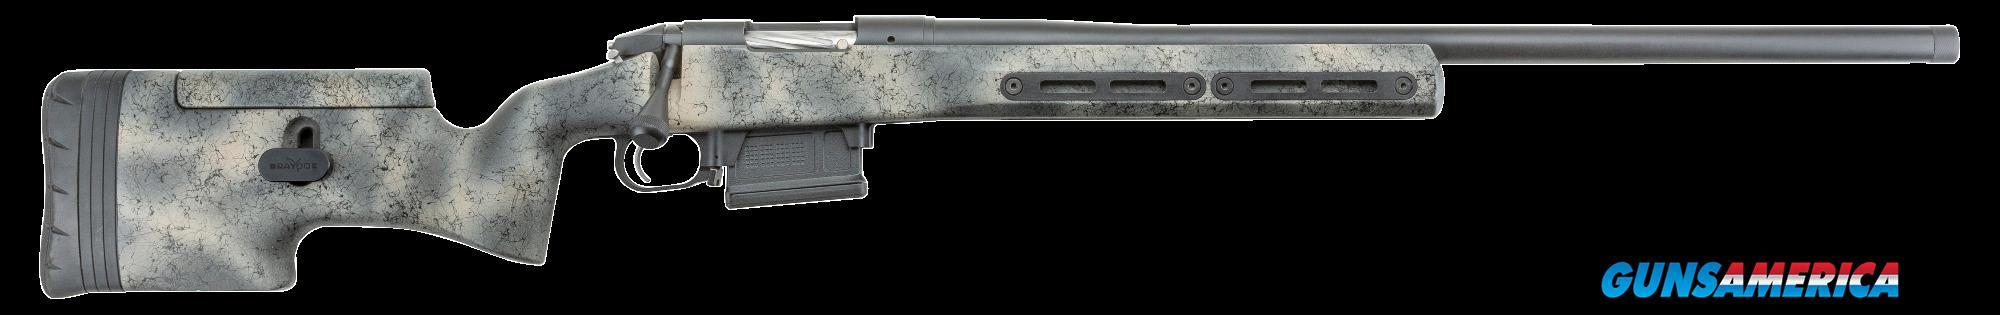 Bergara Rifles Premier, Bergara Bpr2265f      6.5cr   Ridgeback  Tb  Guns > Pistols > 1911 Pistol Copies (non-Colt)